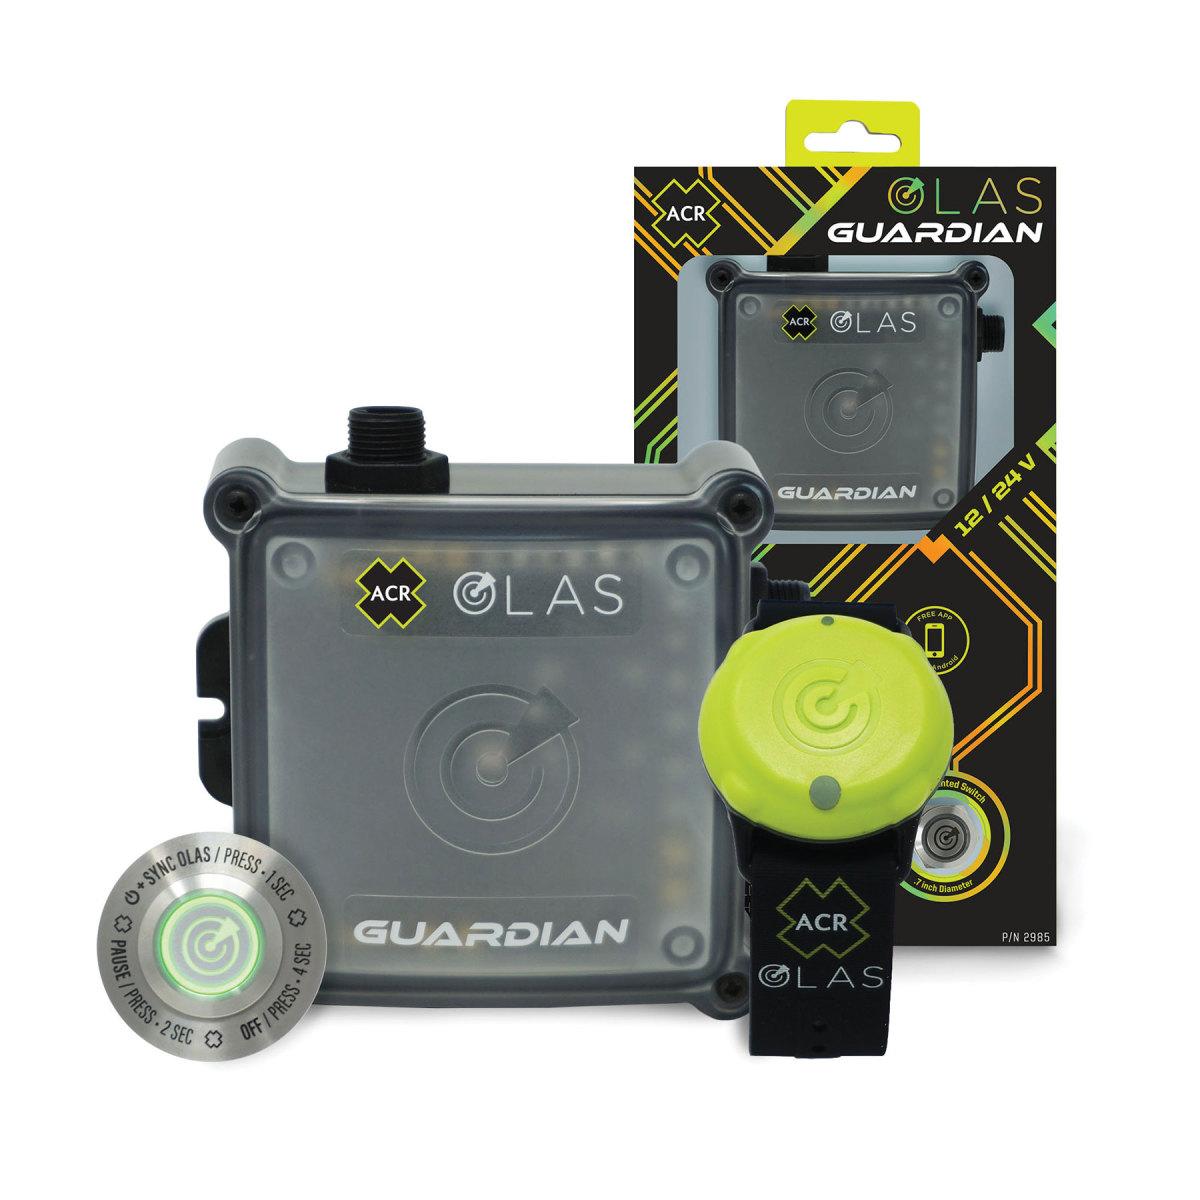 ACR---OLAS-GUARDIAN---Package-Items-2